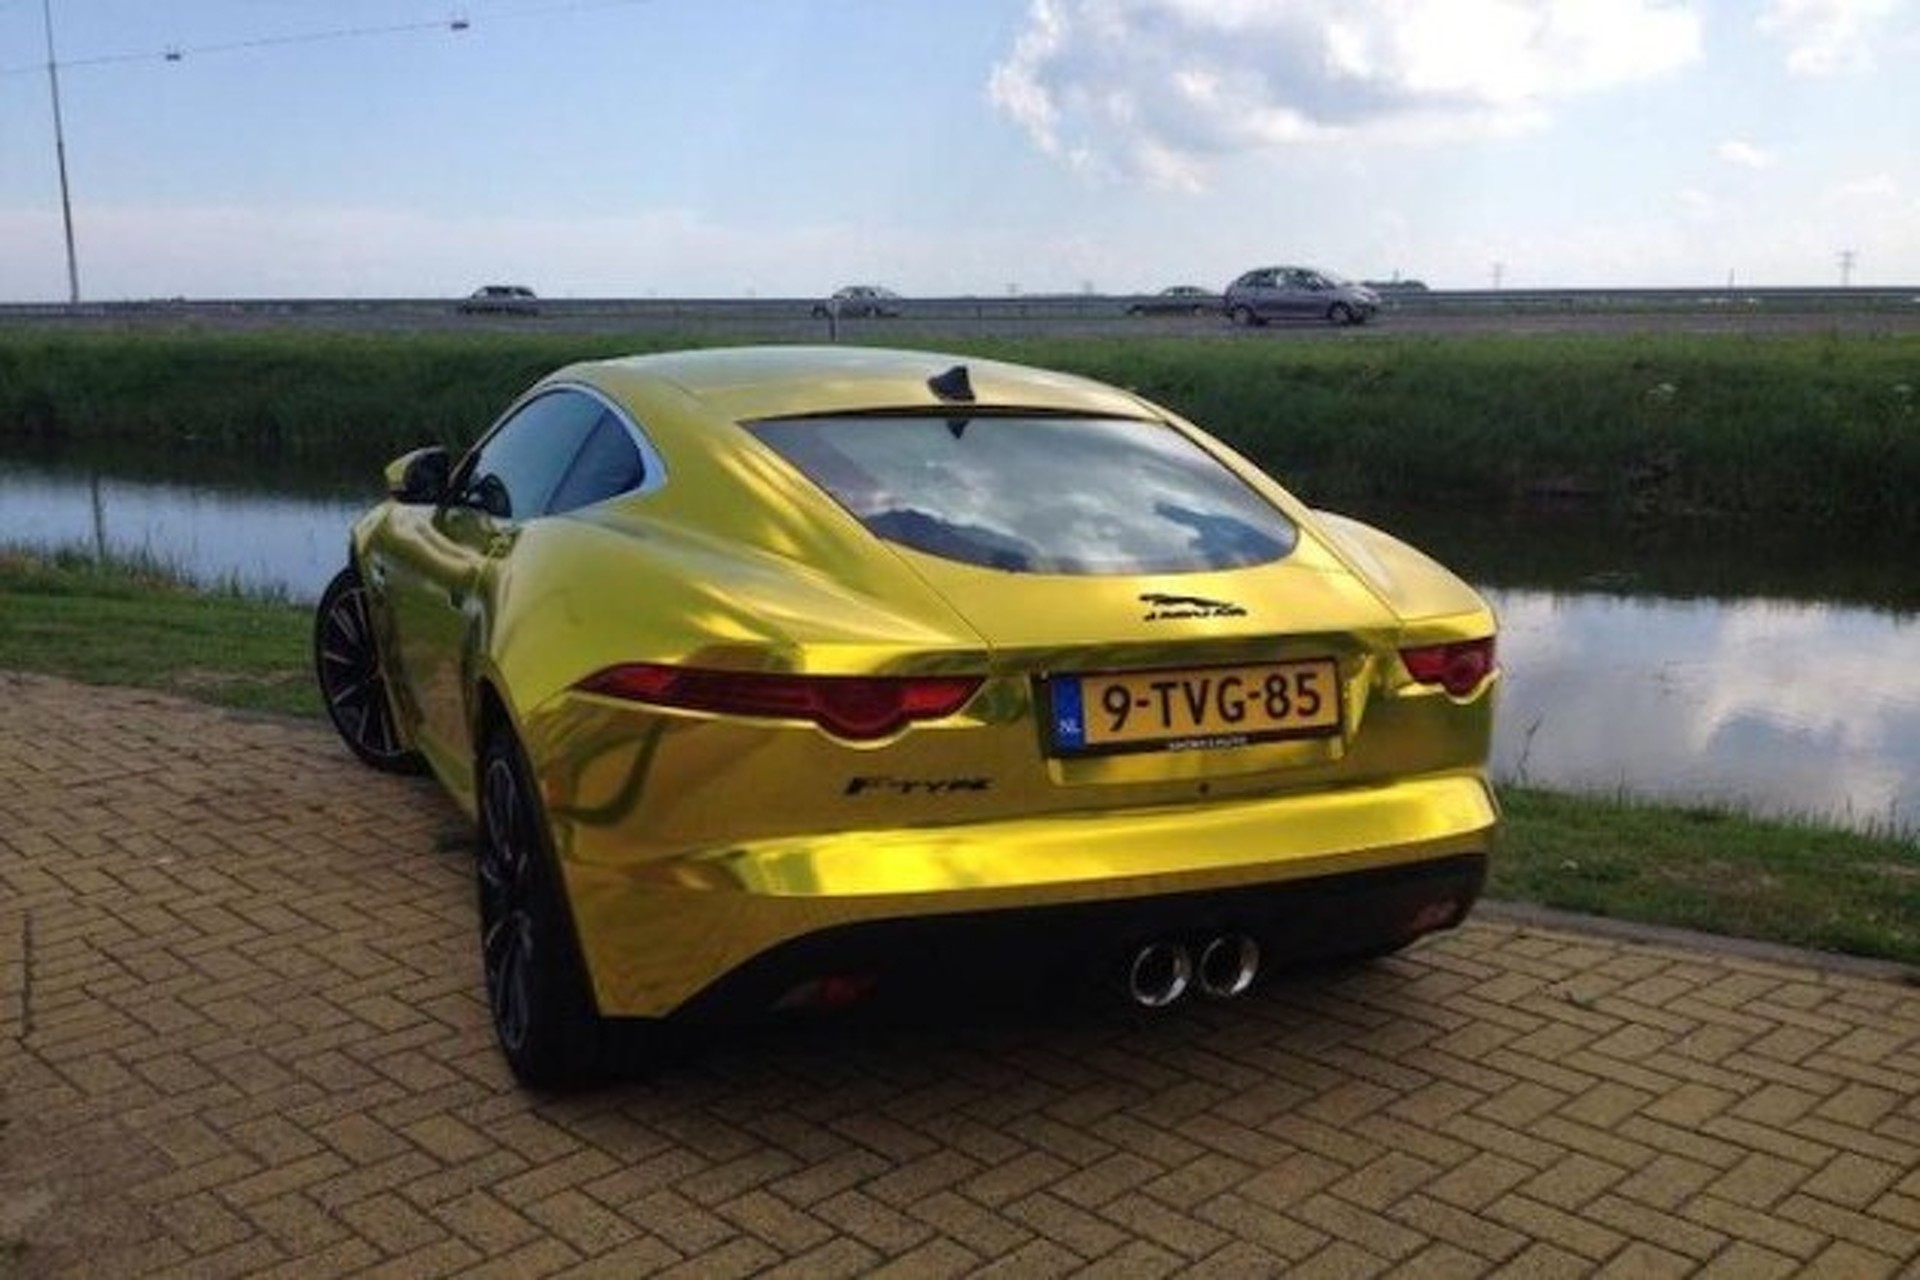 Great Terrible Gold Chrome Jaguar F Type Meets Terrible Gold Chrome Land Rover Gallery